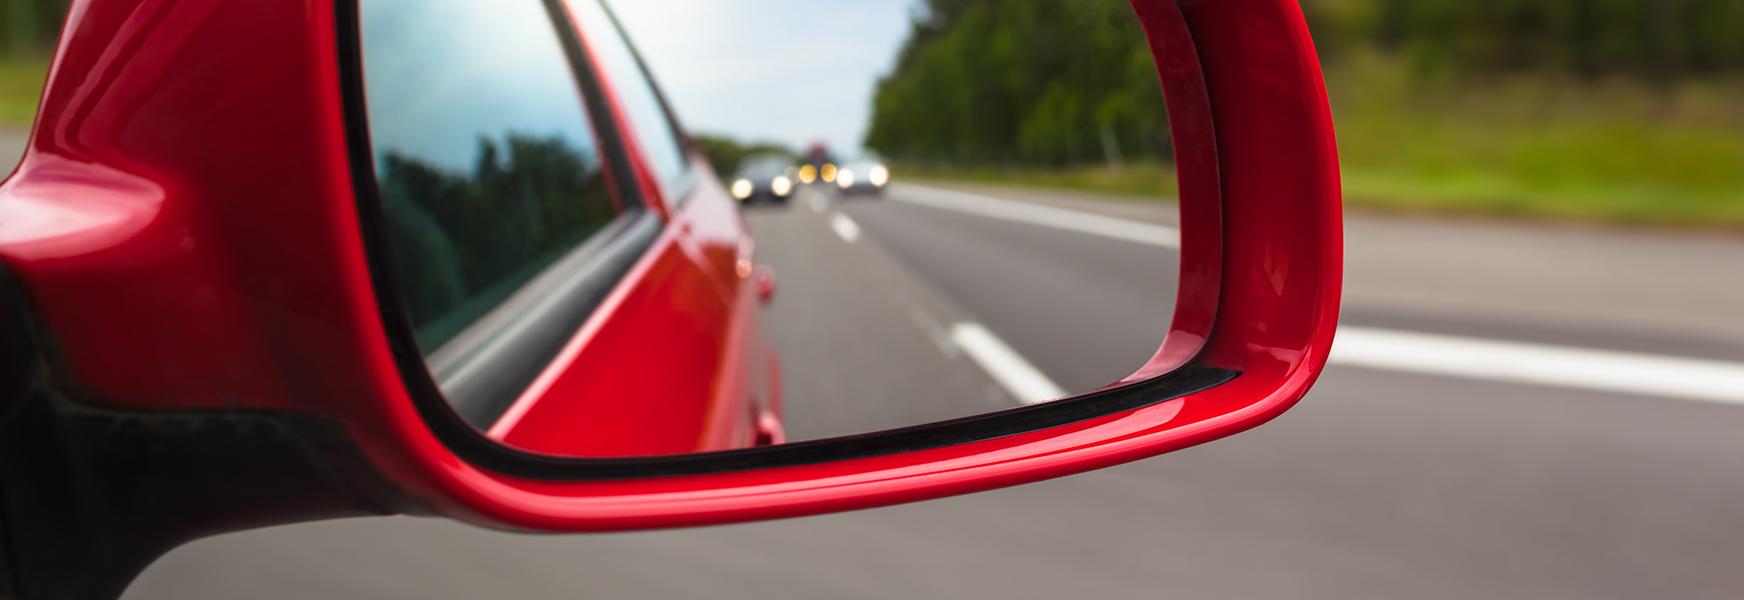 Automobile mirror adjustment to eliminate blind spots